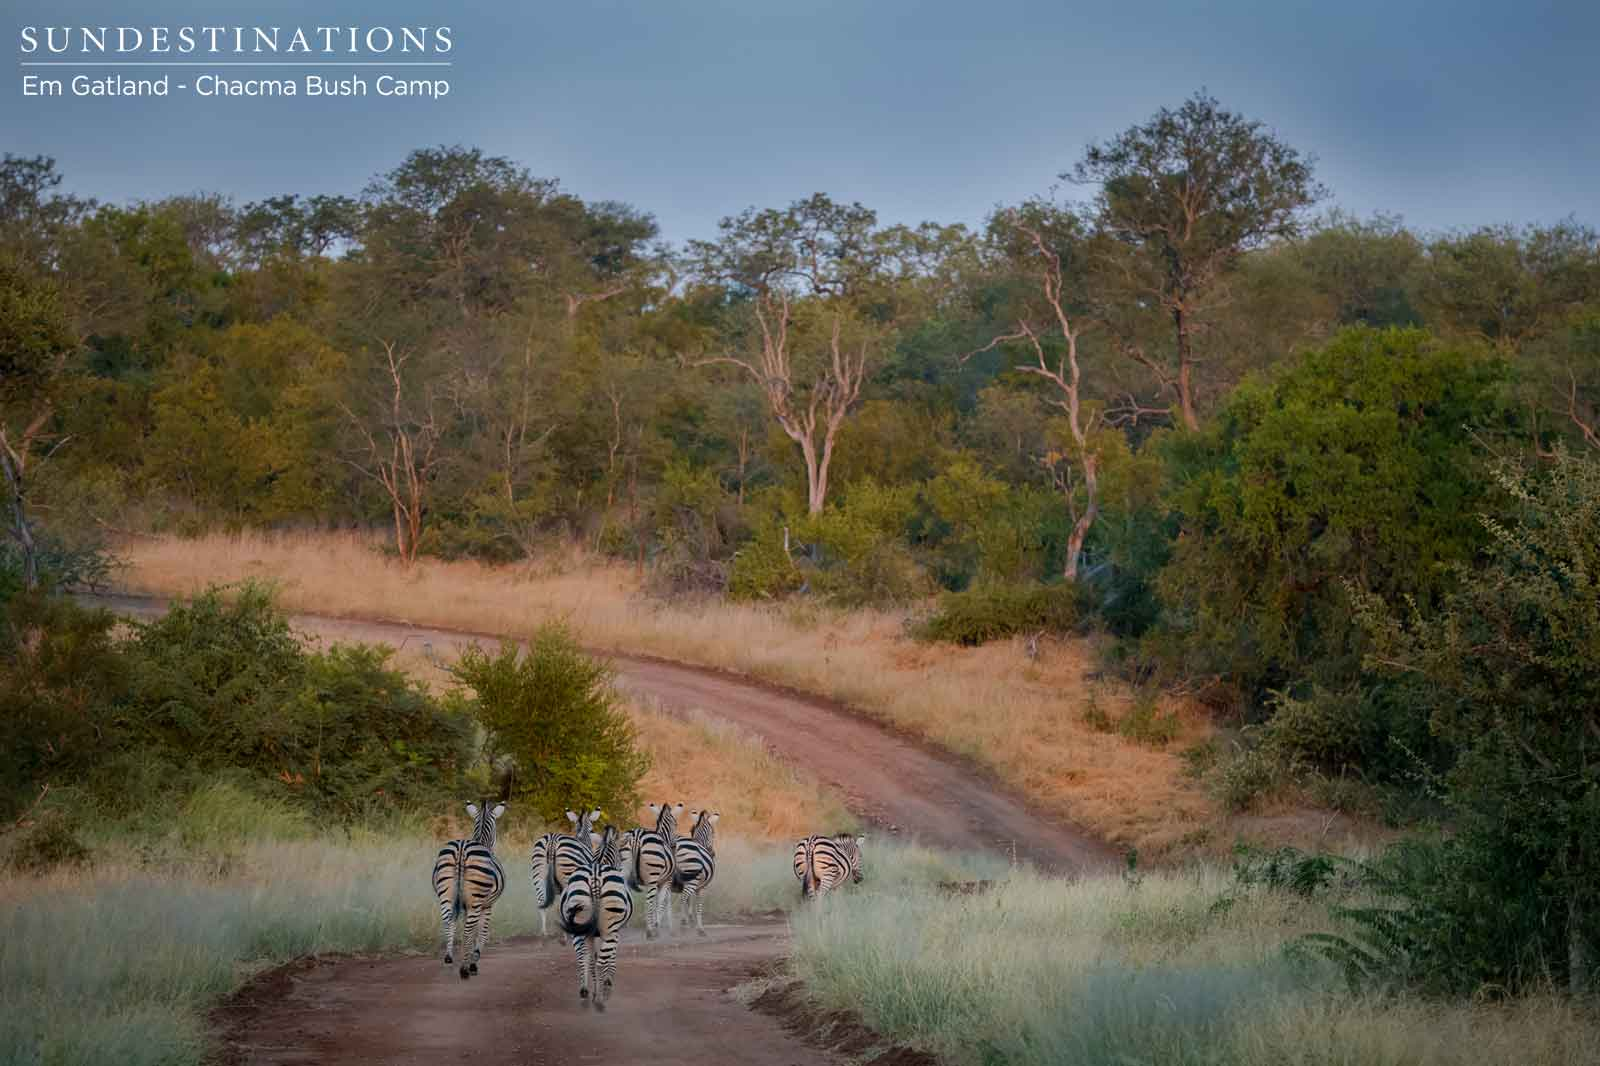 Zebra at Chacma Bush Camp